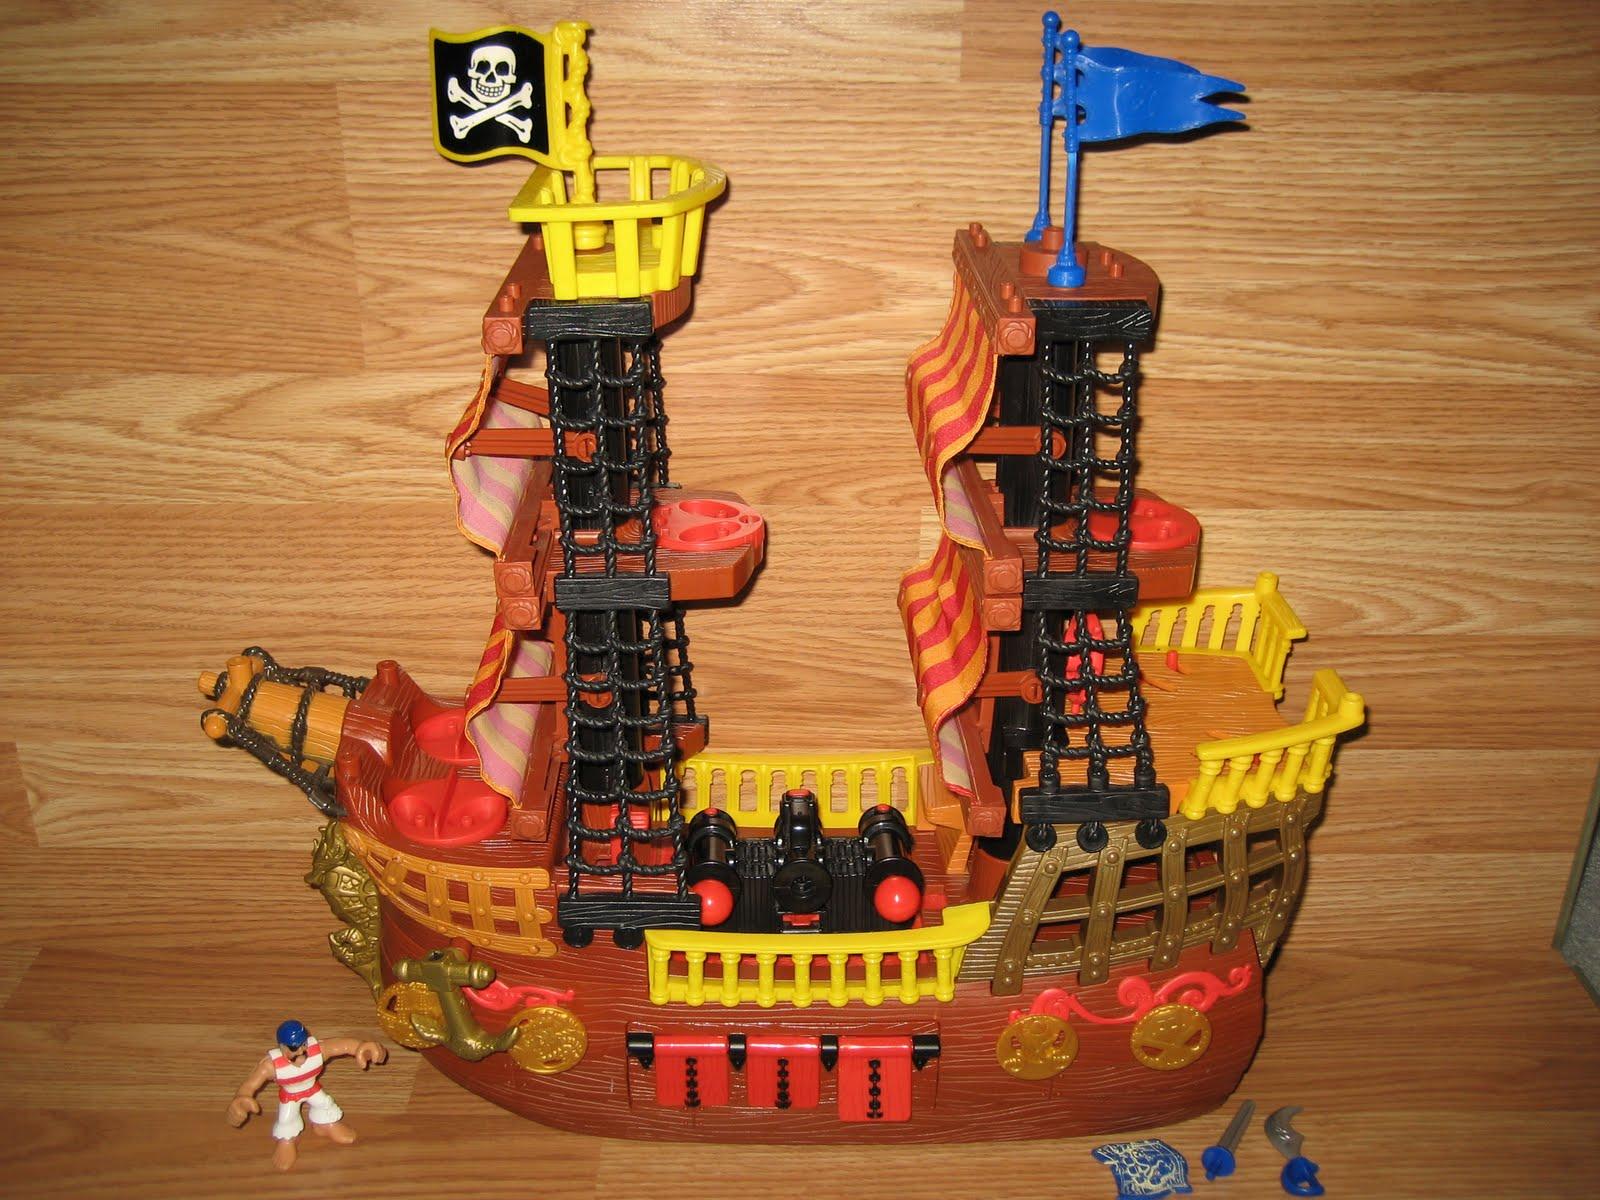 noboxtospeakof ( no box to speak of ): Imaginext Adventures Pirate Ship 2006 Fisher Price ...